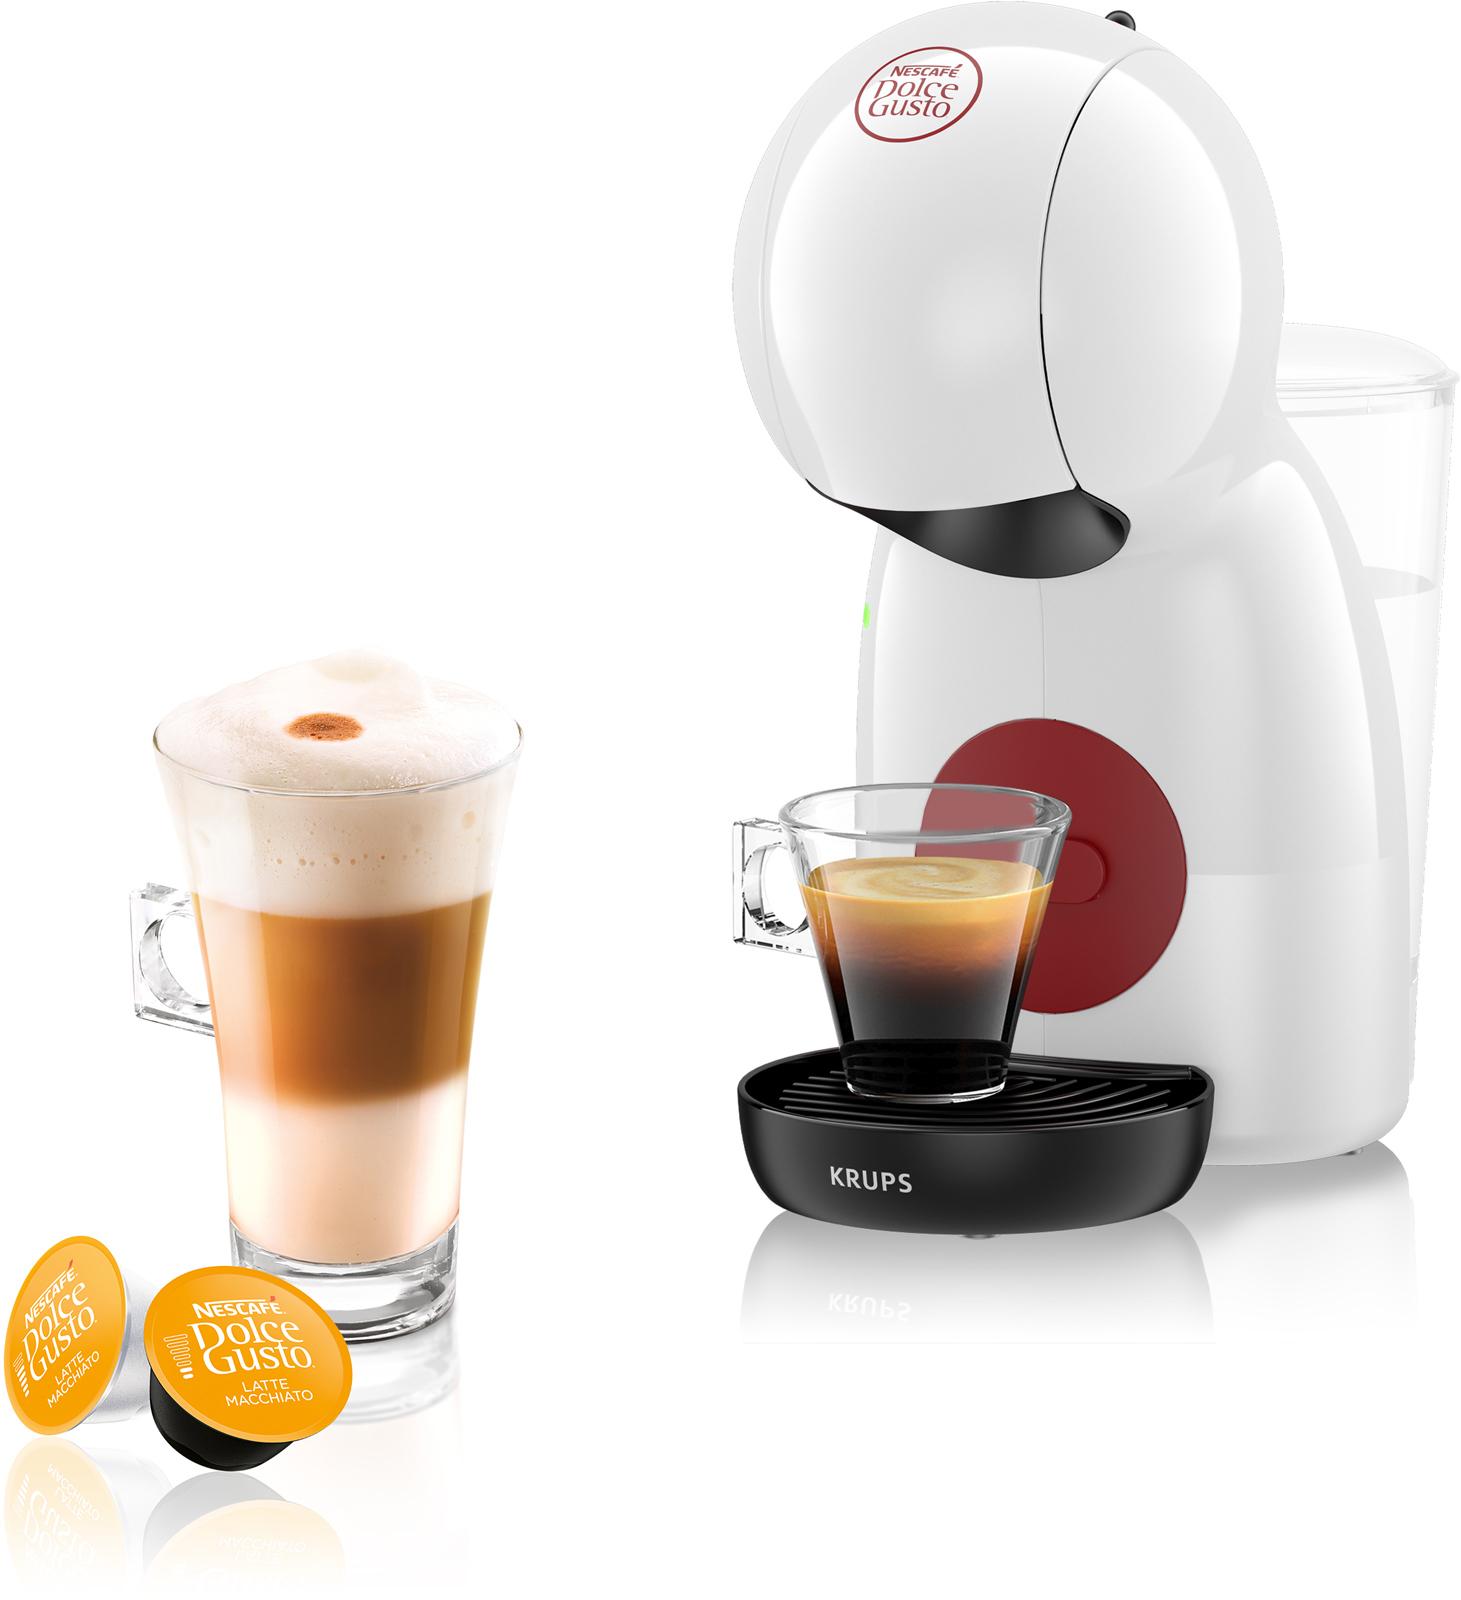 Nescafé Dolce Gusto Piccolo XS KP1A01 (Wit) - Prijsvergelijk